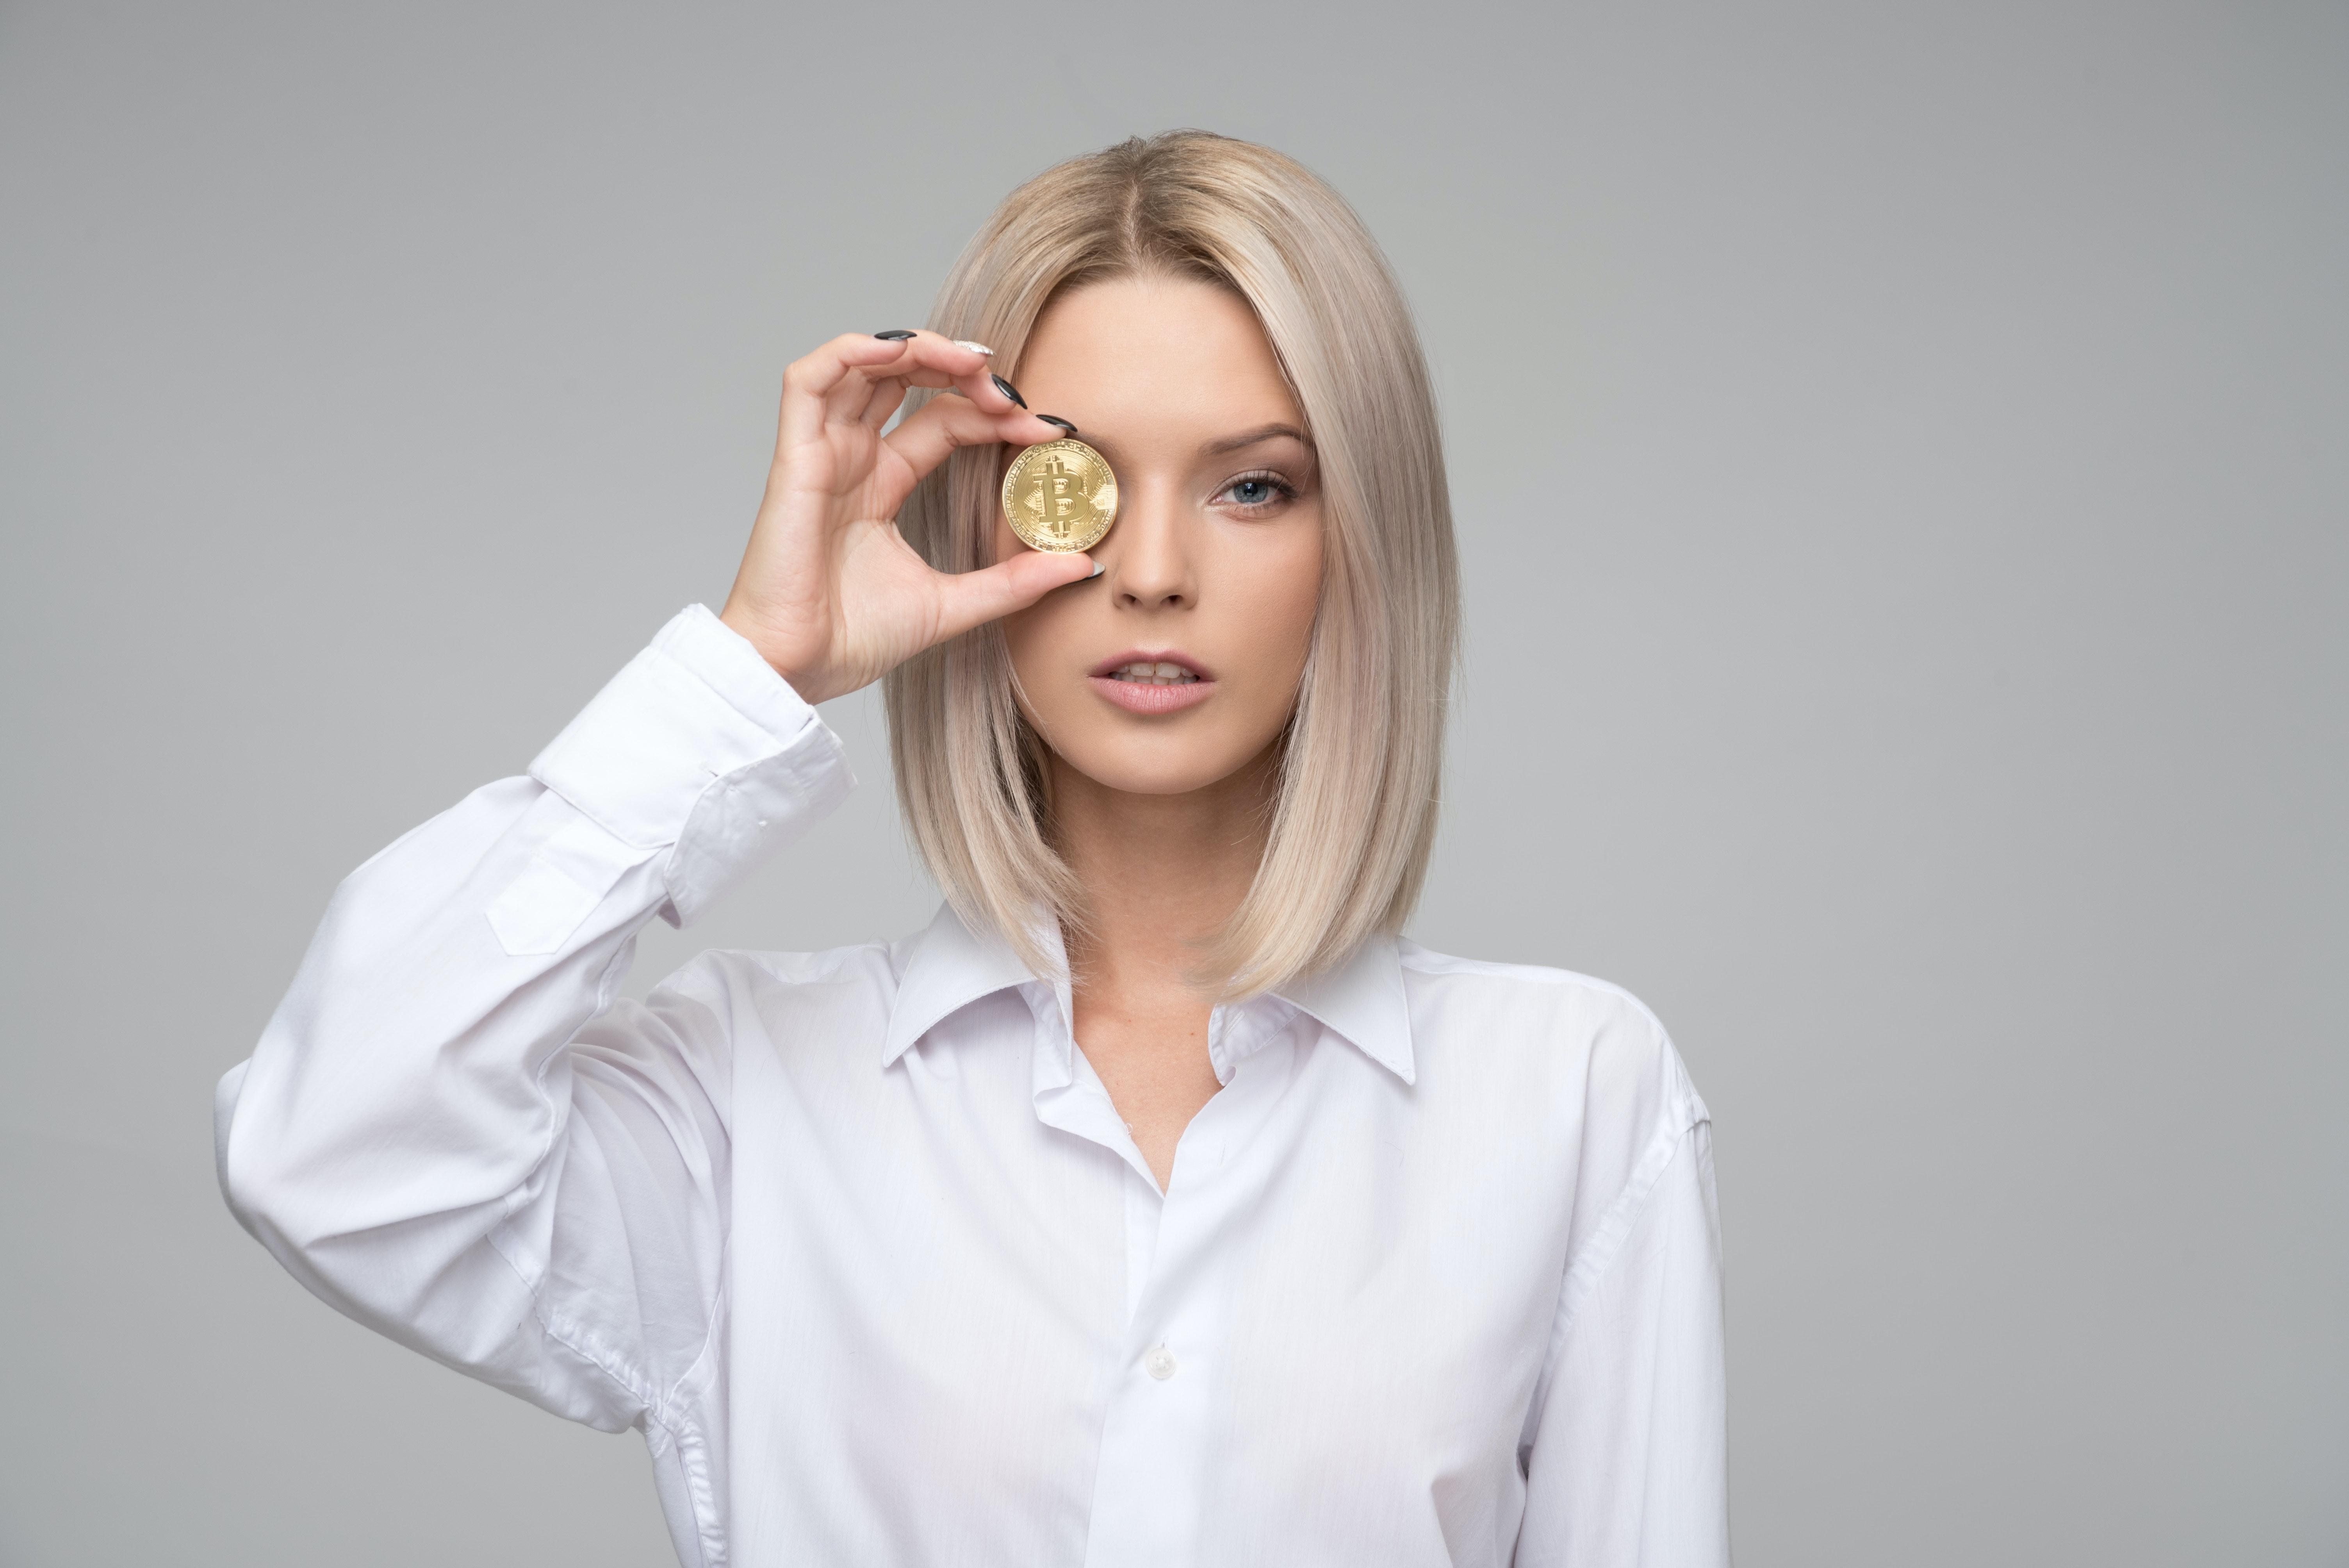 women-s-white-button-up-long-sleeved-shi